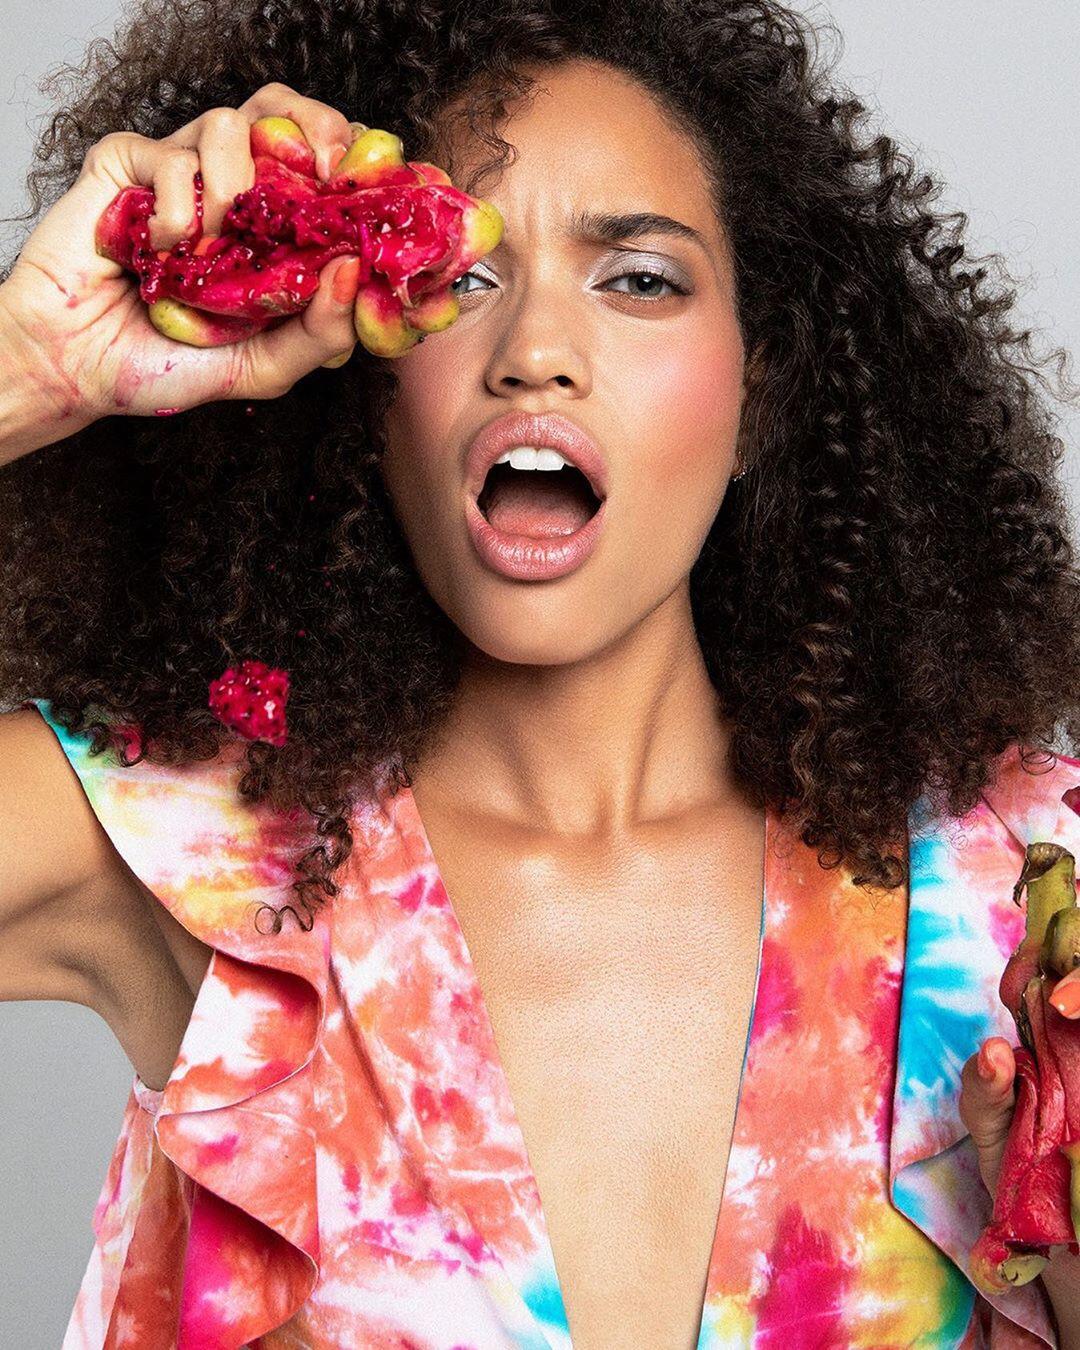 Kosas Cosmetics, Beauty Undone Campaign